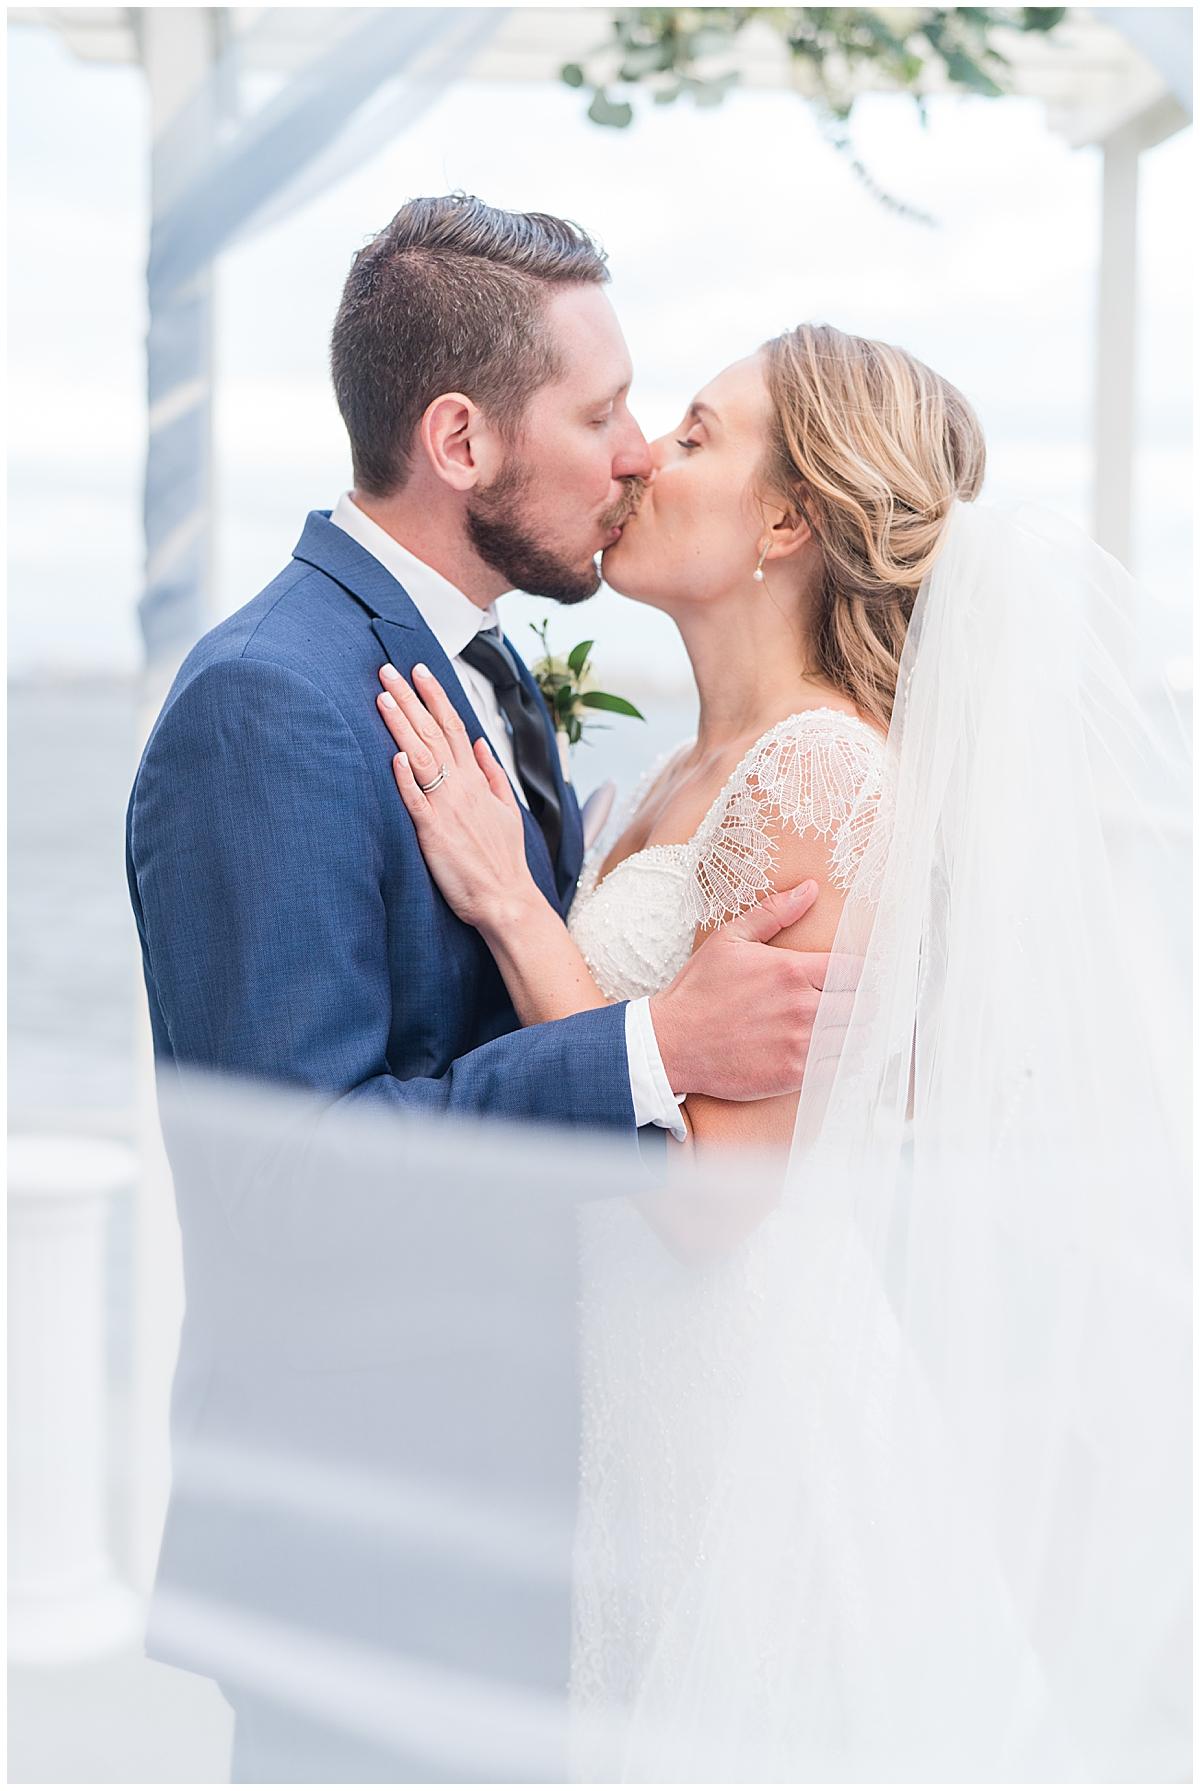 newlyweds kiss by arbor at Charleston Aquarium Wedding ceremony